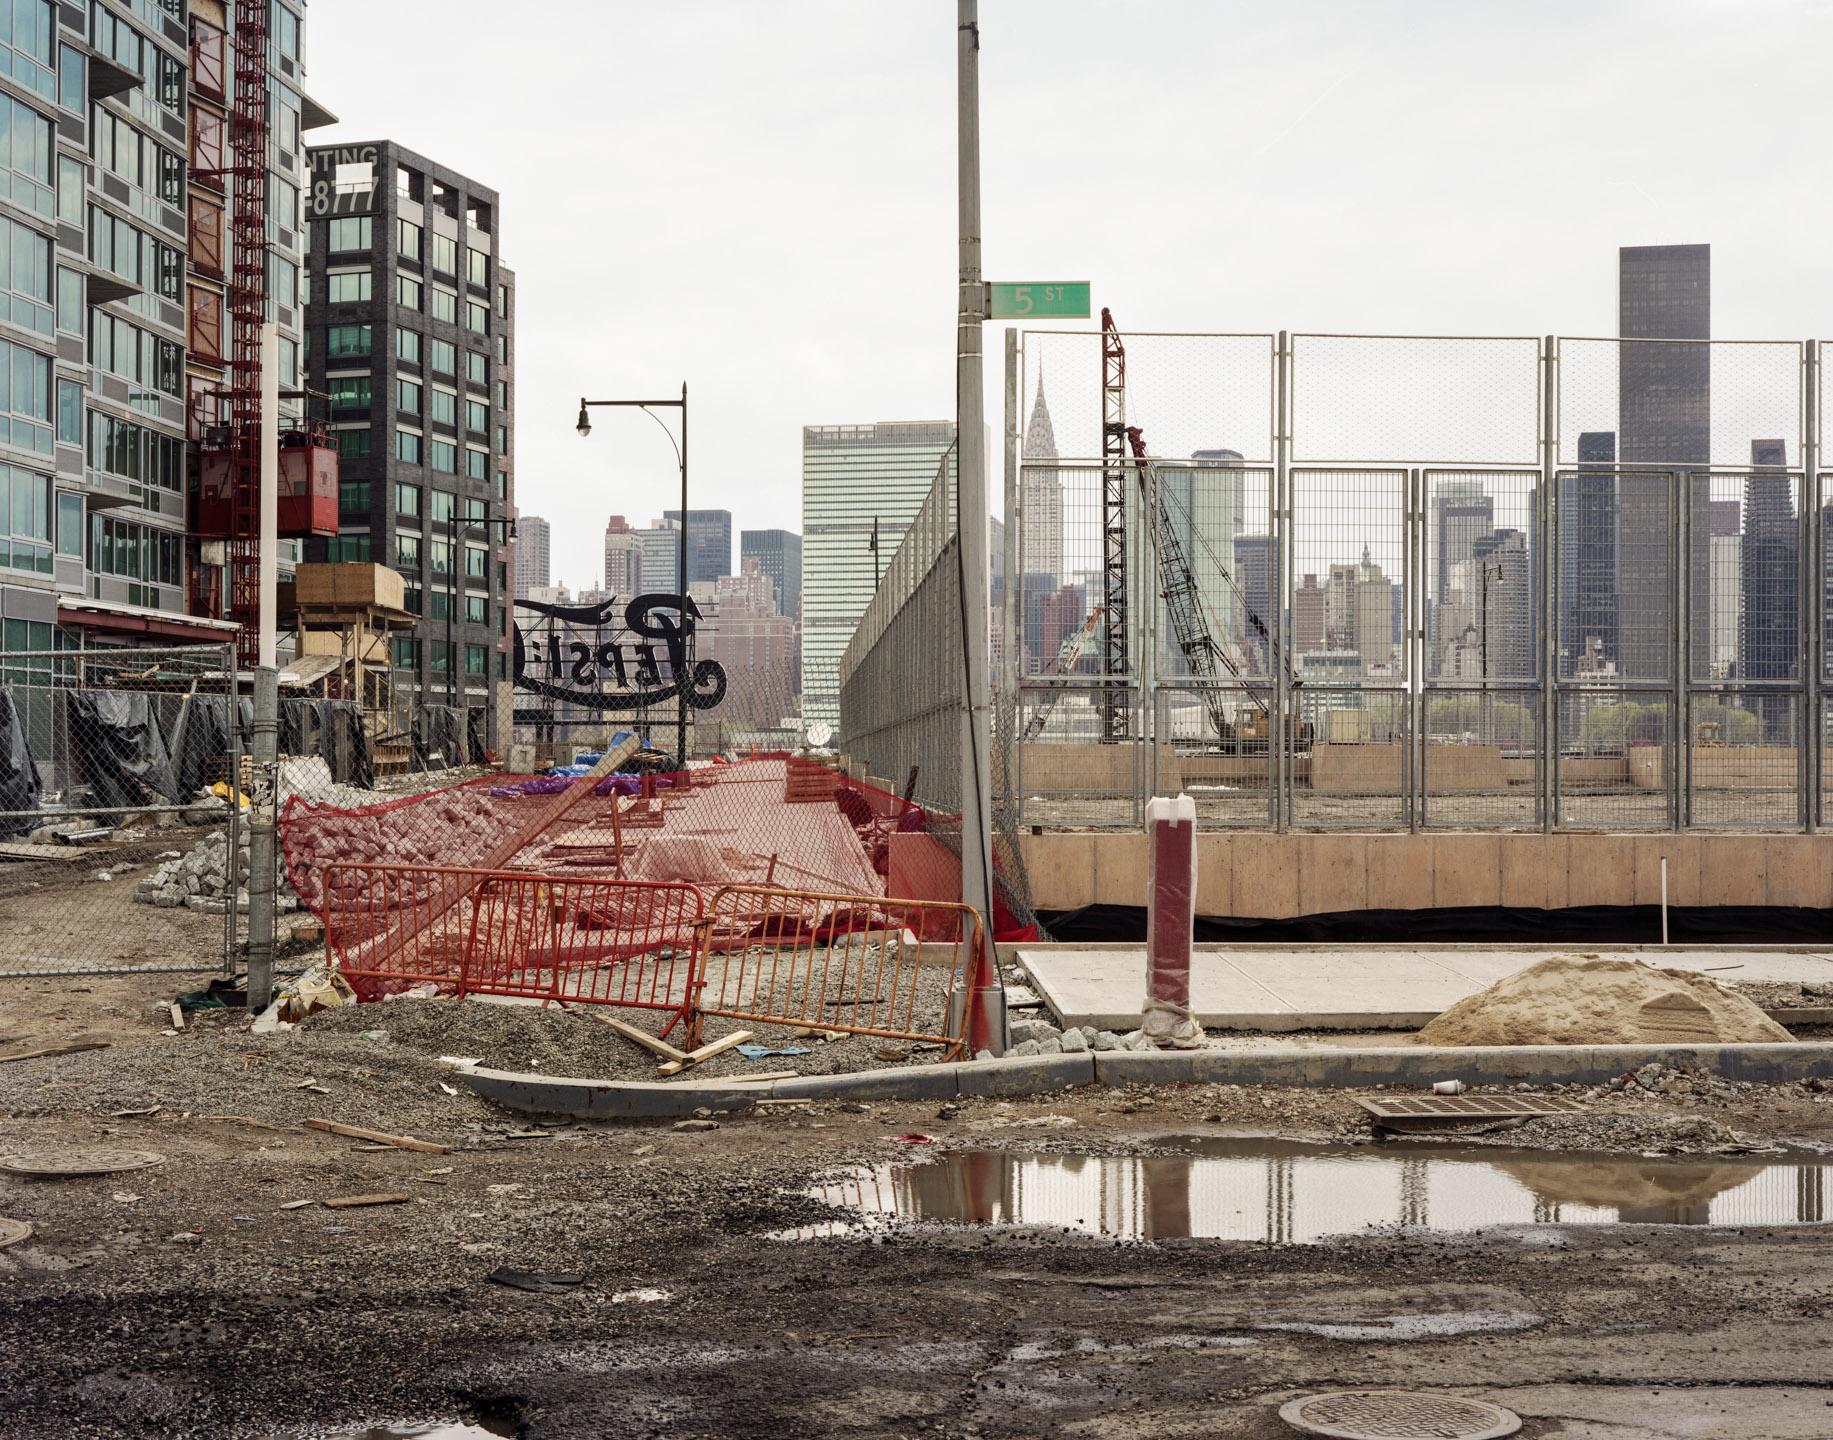 Condo Construction, Long Island City, New York, 2008